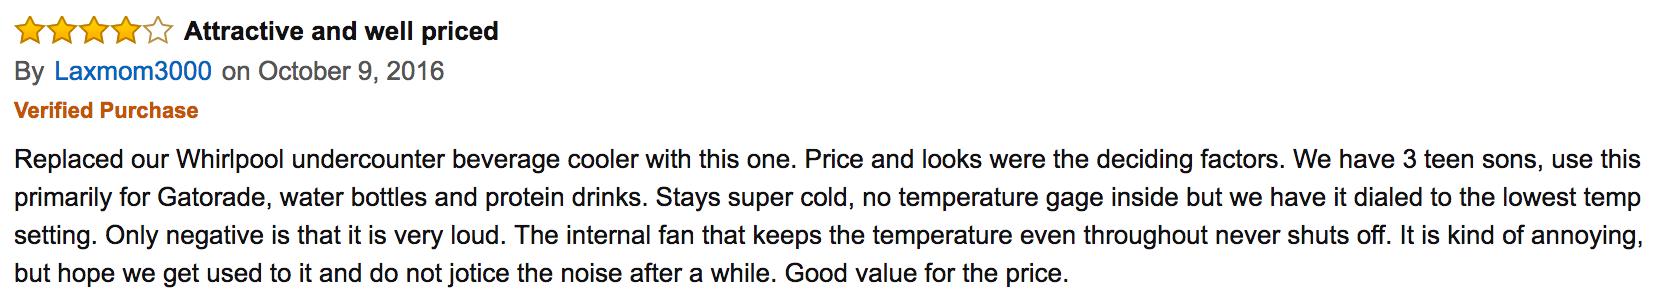 whynter-beverage-refrigerator-reviews